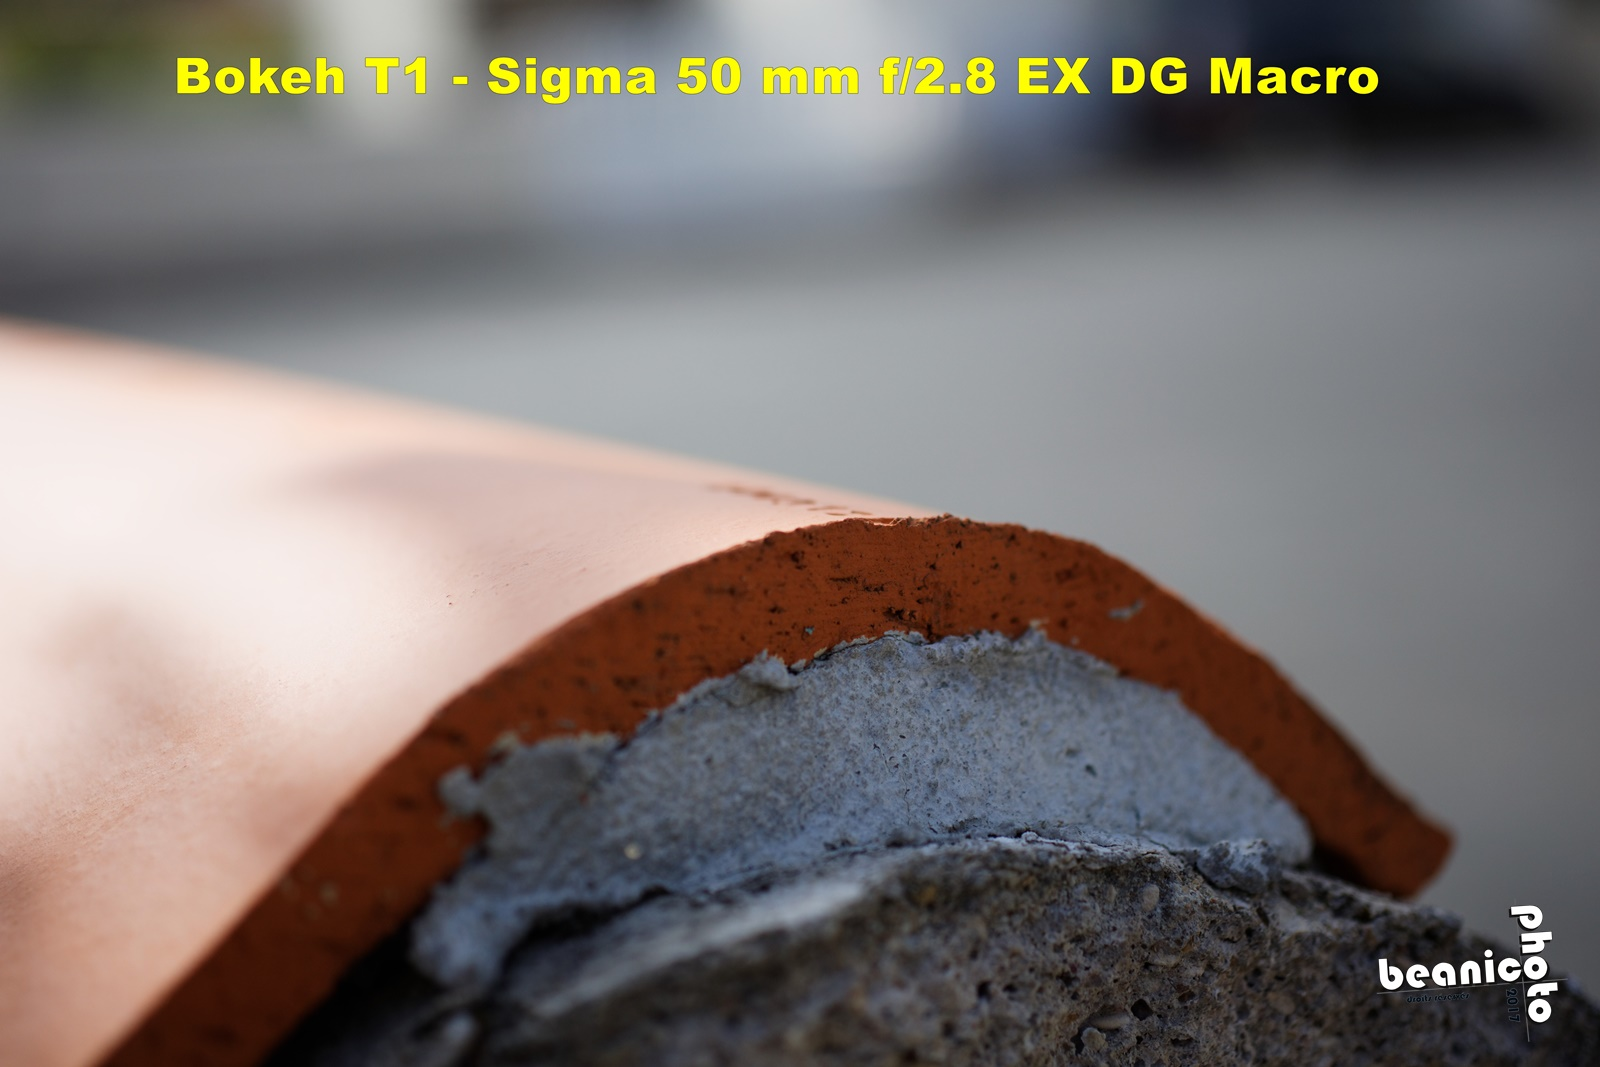 Canon 5DIII + Sigma 50 mm f/2.8 EX DG Macro - Bokeh f/2.8 - beanico-photo